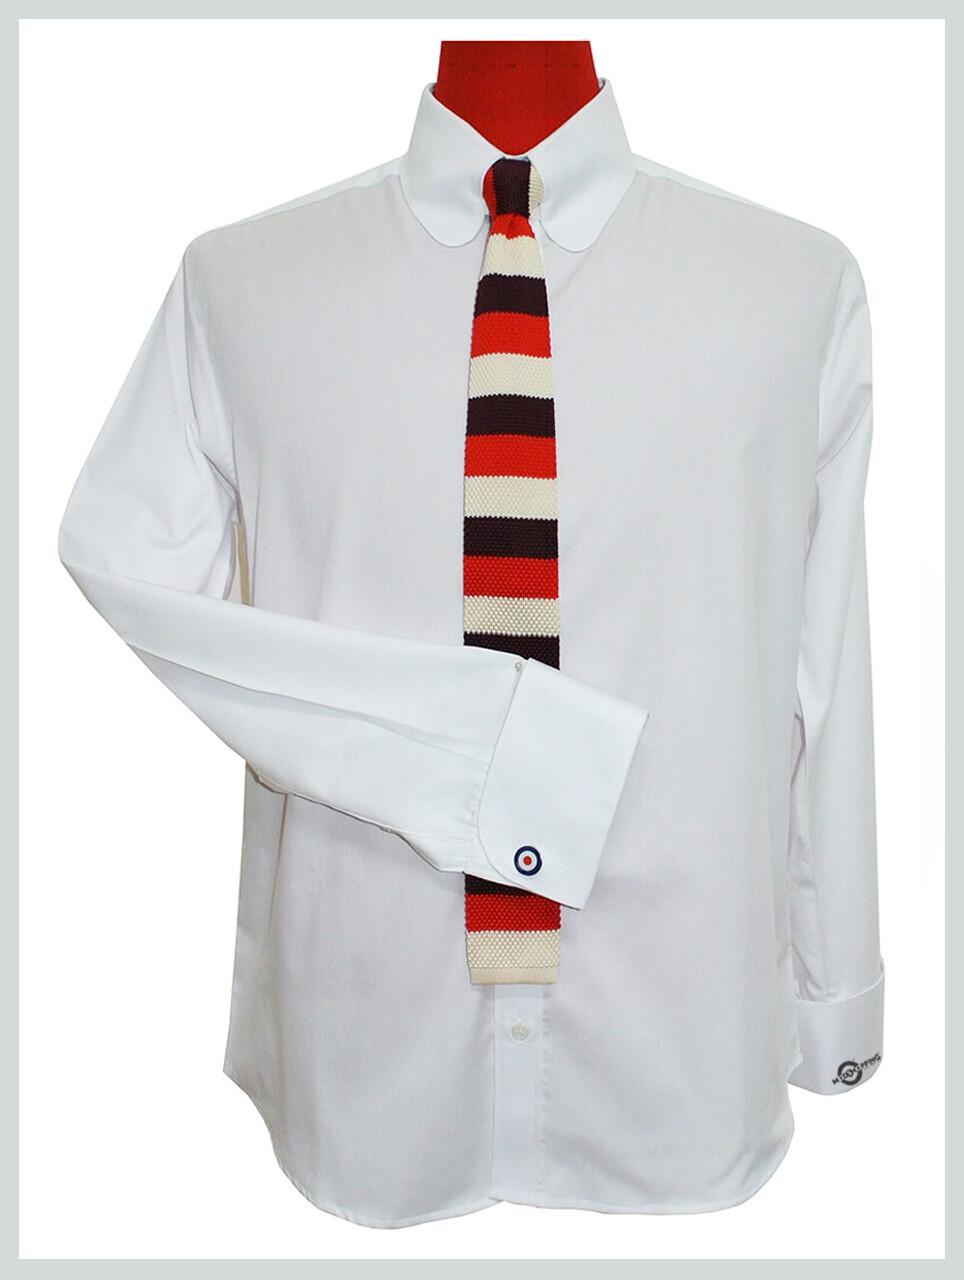 Tab Collar Shirt| 60s Style White Tab Collar Shirt For Men